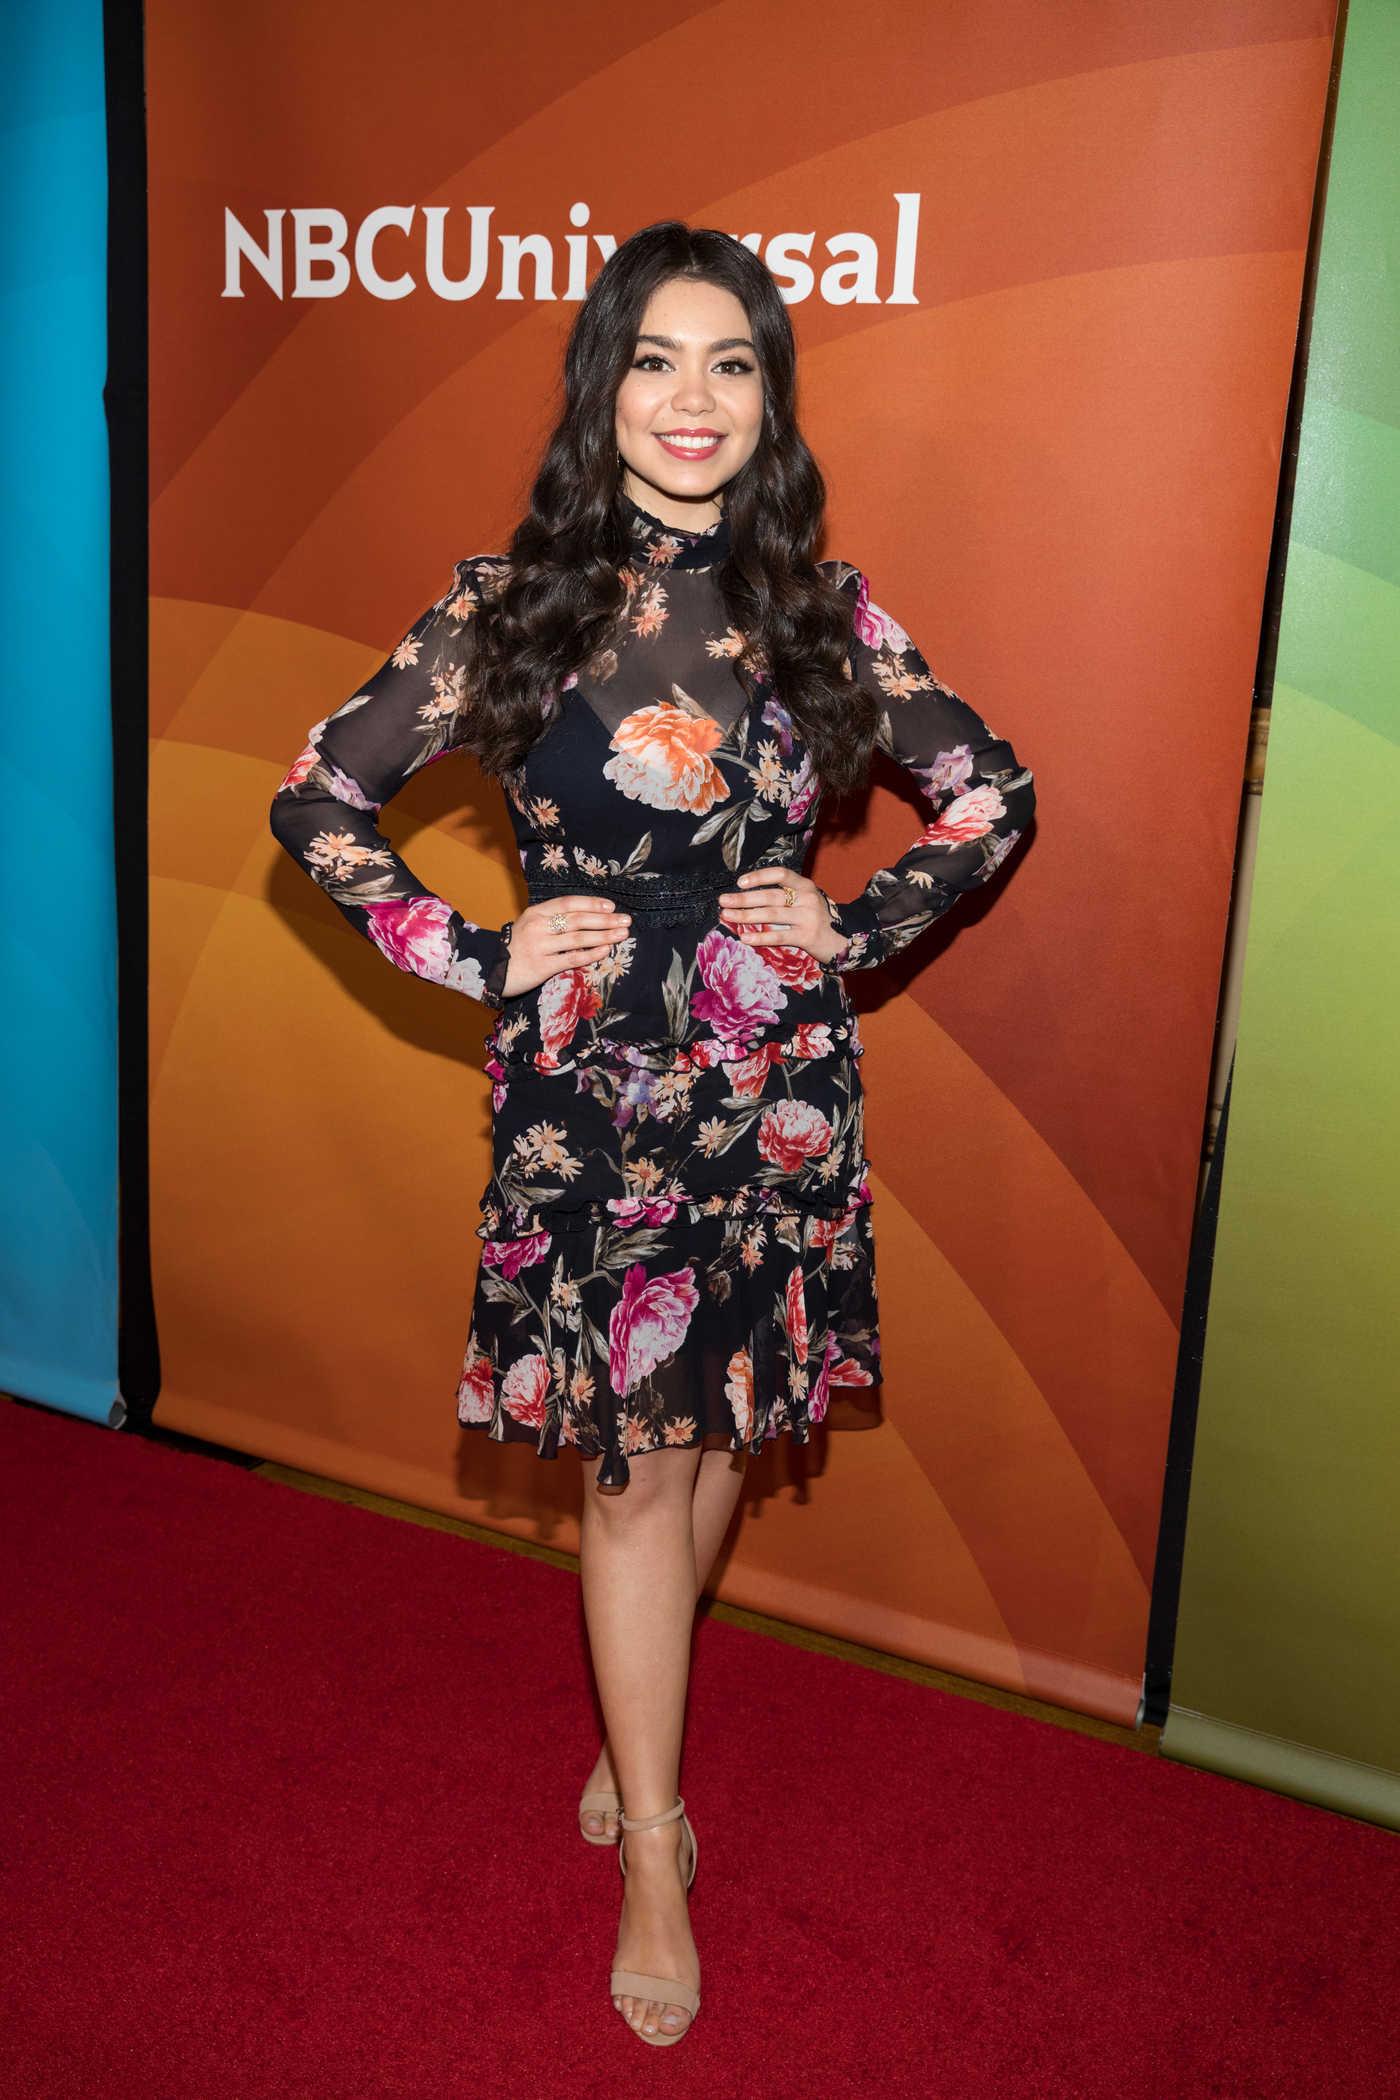 Auli'i Cravalho at NBC Universal TCA Winter Press Tour in Pasadena 01/09/2018